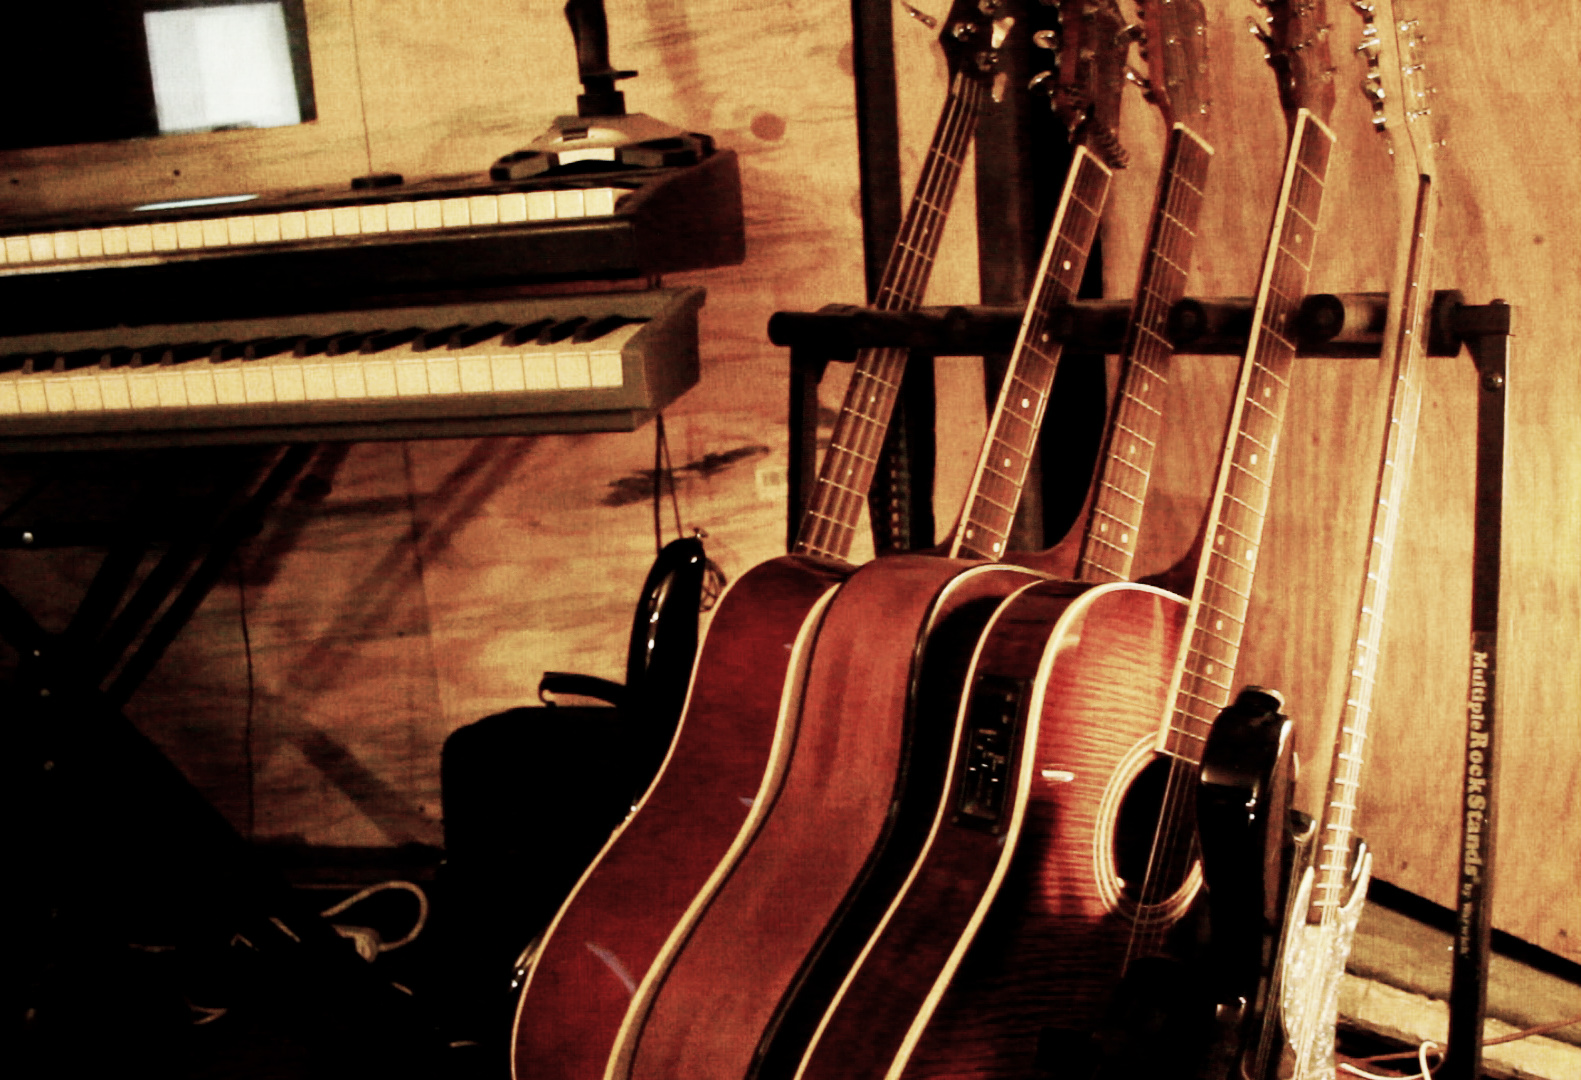 Gold Heart Studios